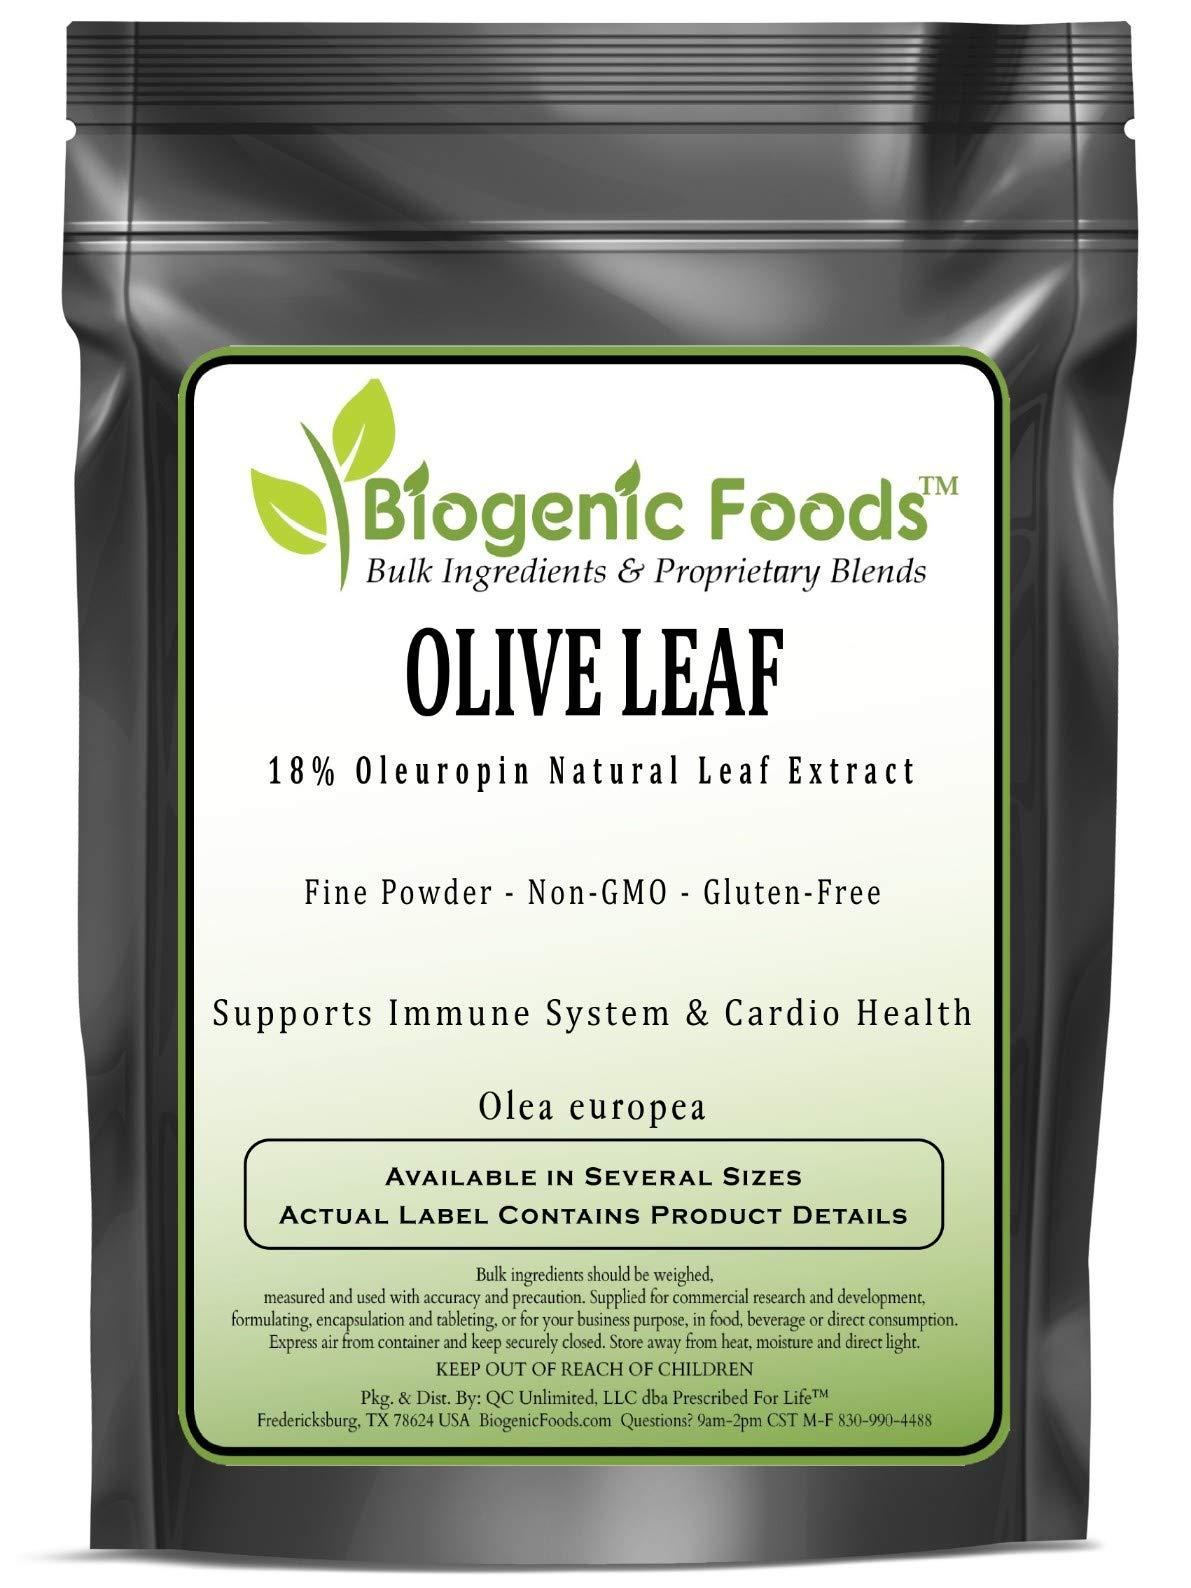 Olive Leaf - 18% Oleuropin Natural Leaf Fine Powder Extract (Olea Europea), 10 kg